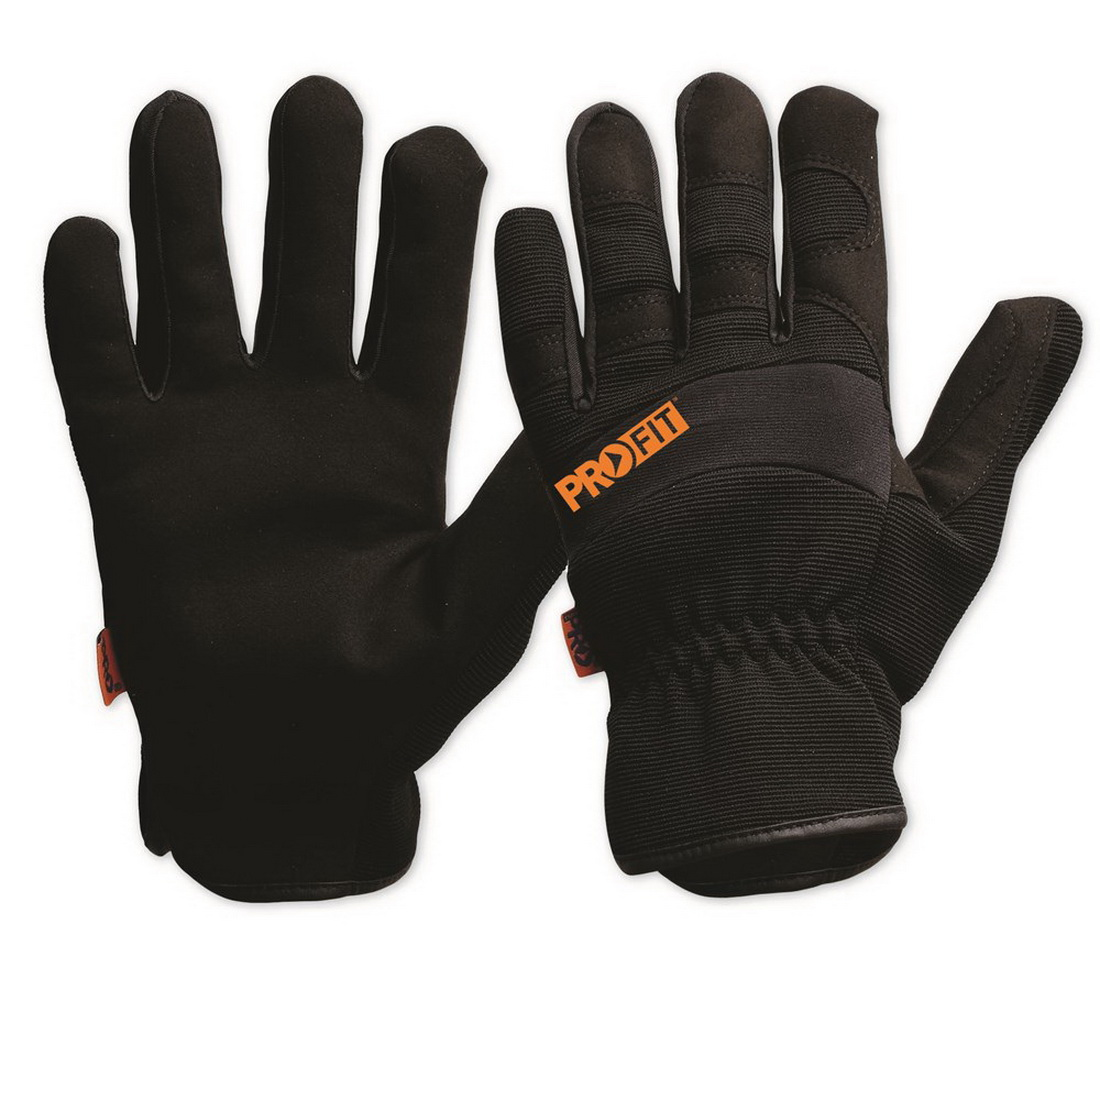 Profit Riggamate Mechanics Gloves Black